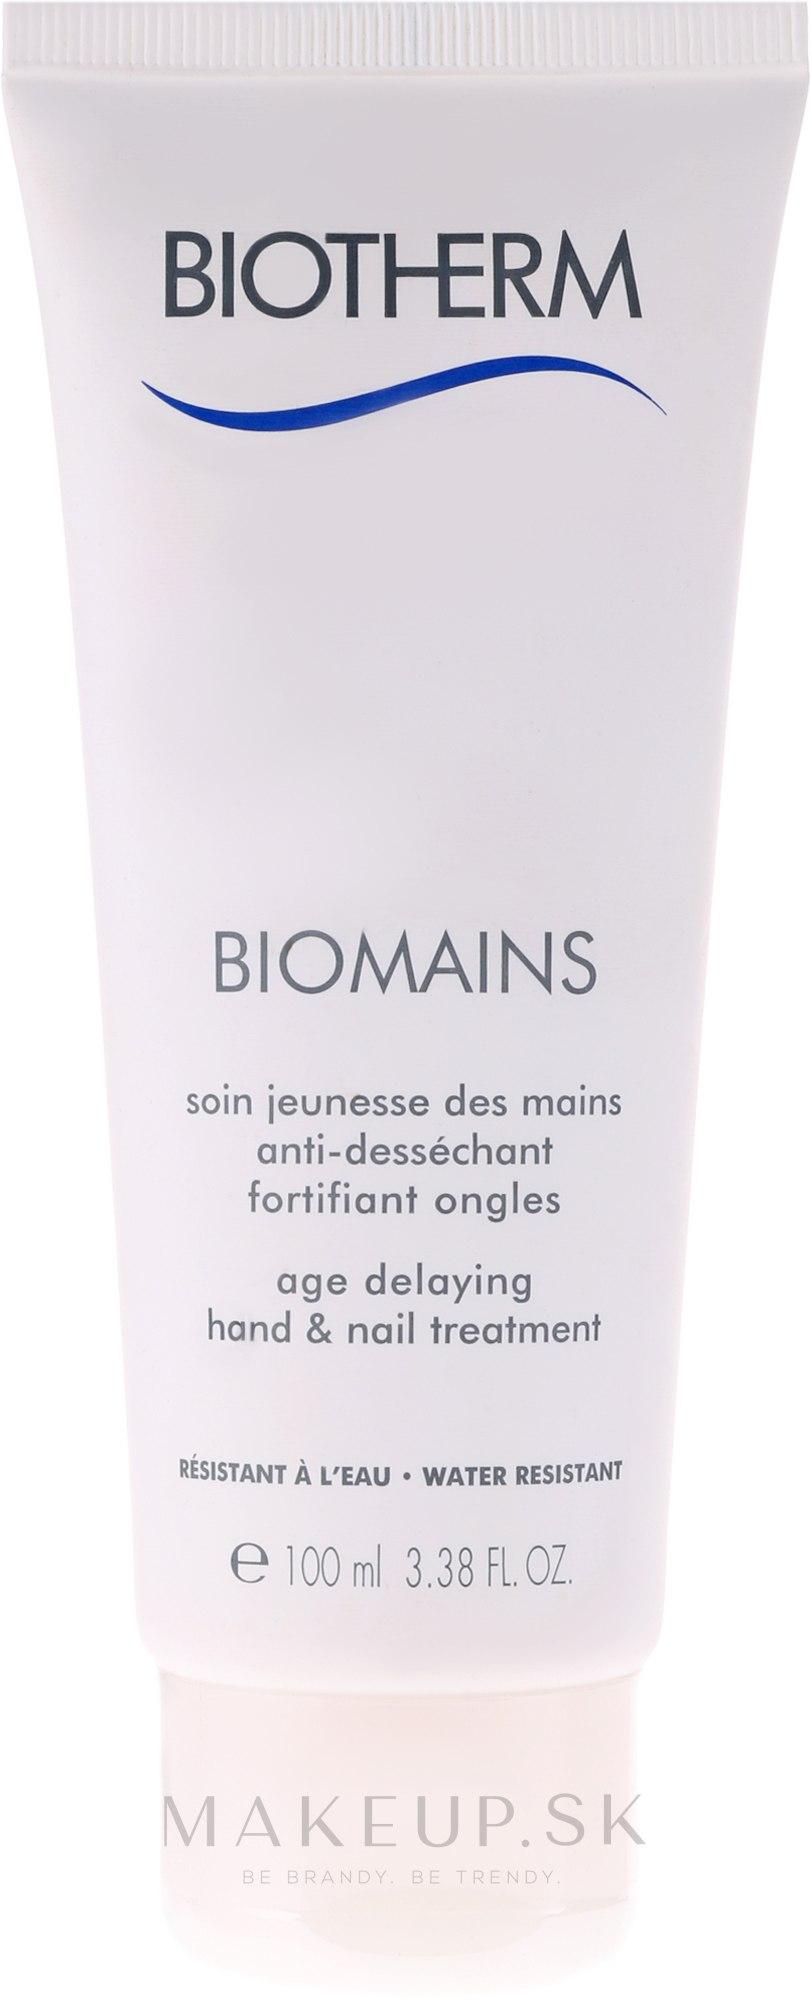 Krém na ruky - Biotherm Biomains Age Delaying Hand & Nail Treatment — Obrázky 100 ml